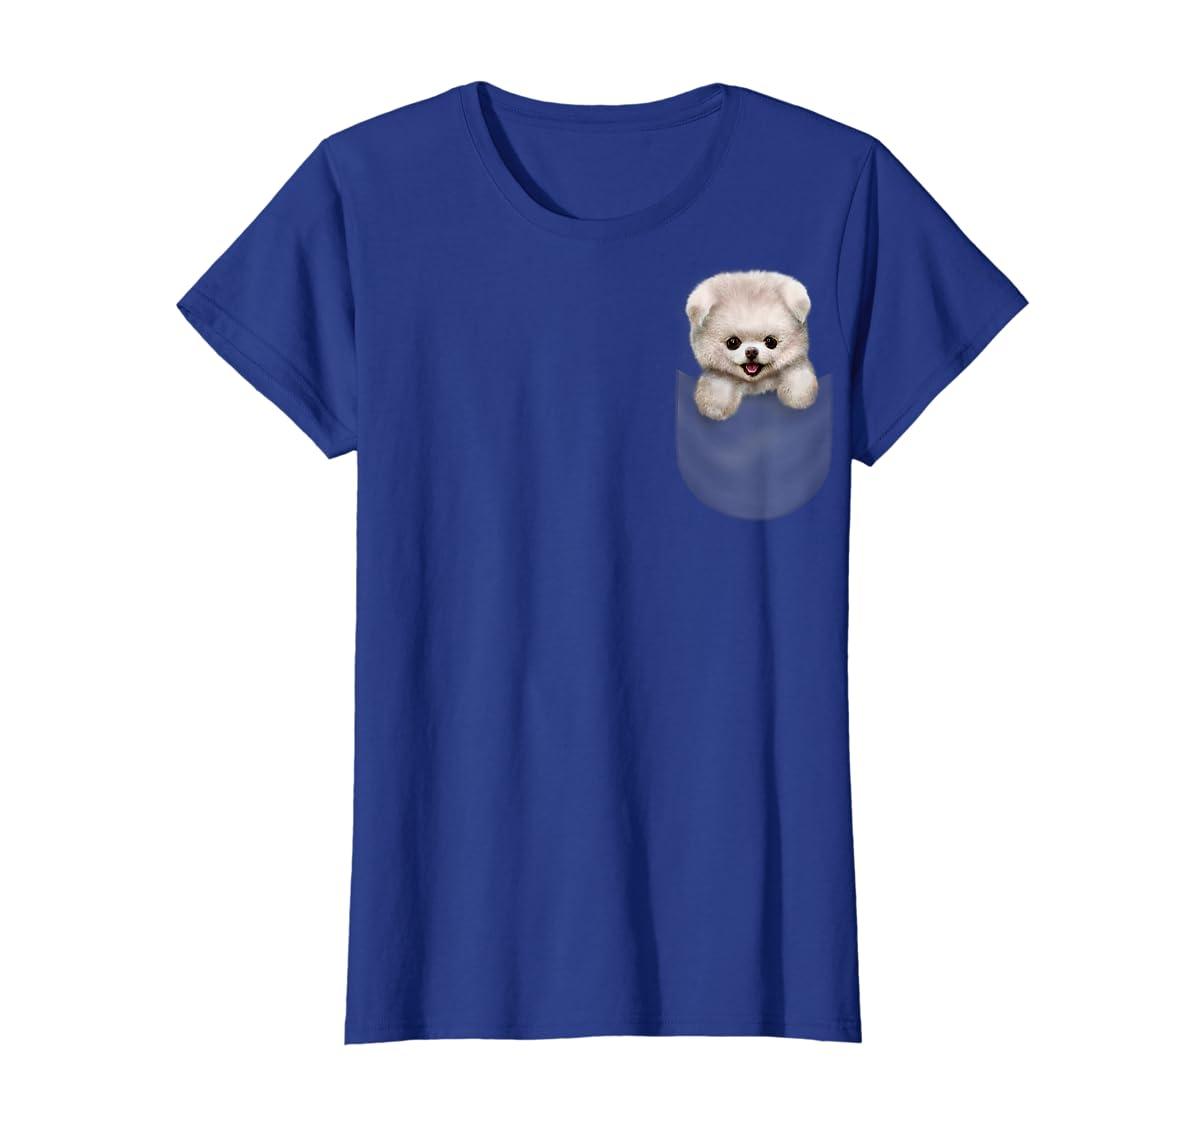 T-Shirt, Cute White Fluffy Pomeranian Puppy in Pocket, Dog-Women's T-Shirt-Royal